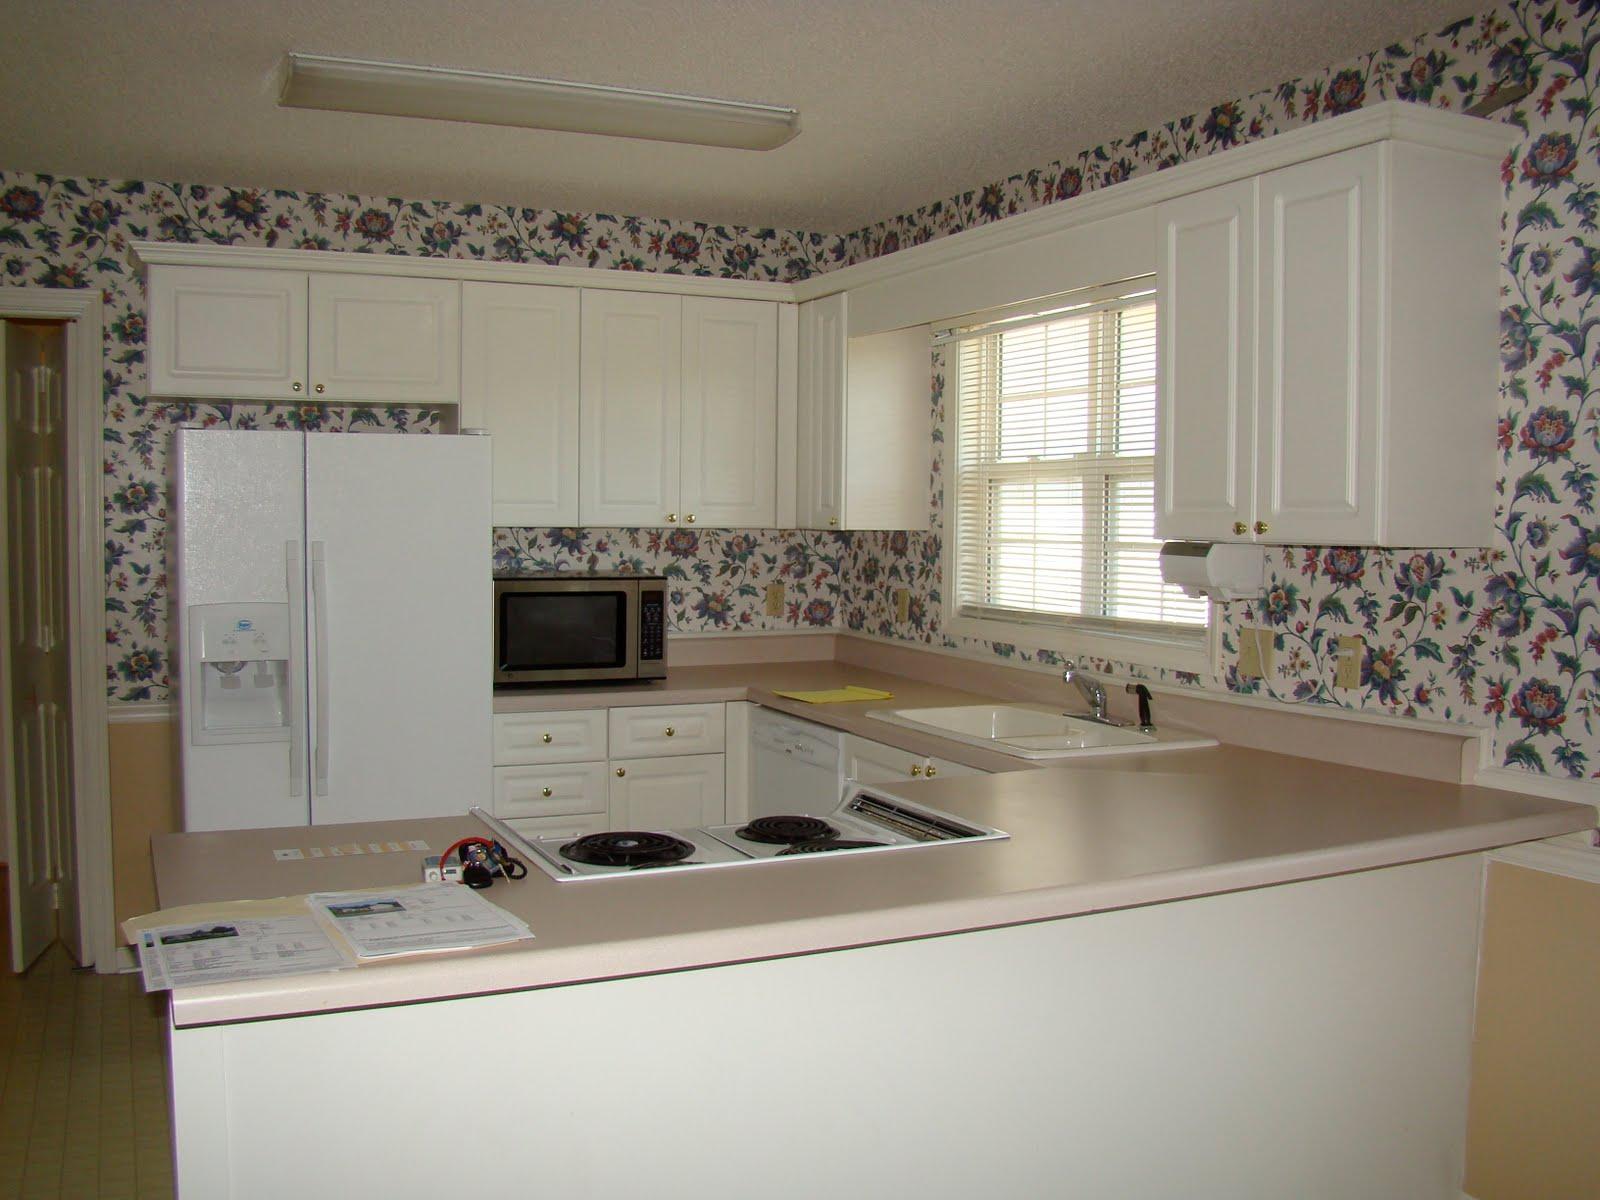 Варианты отделки стен на кухне обоями